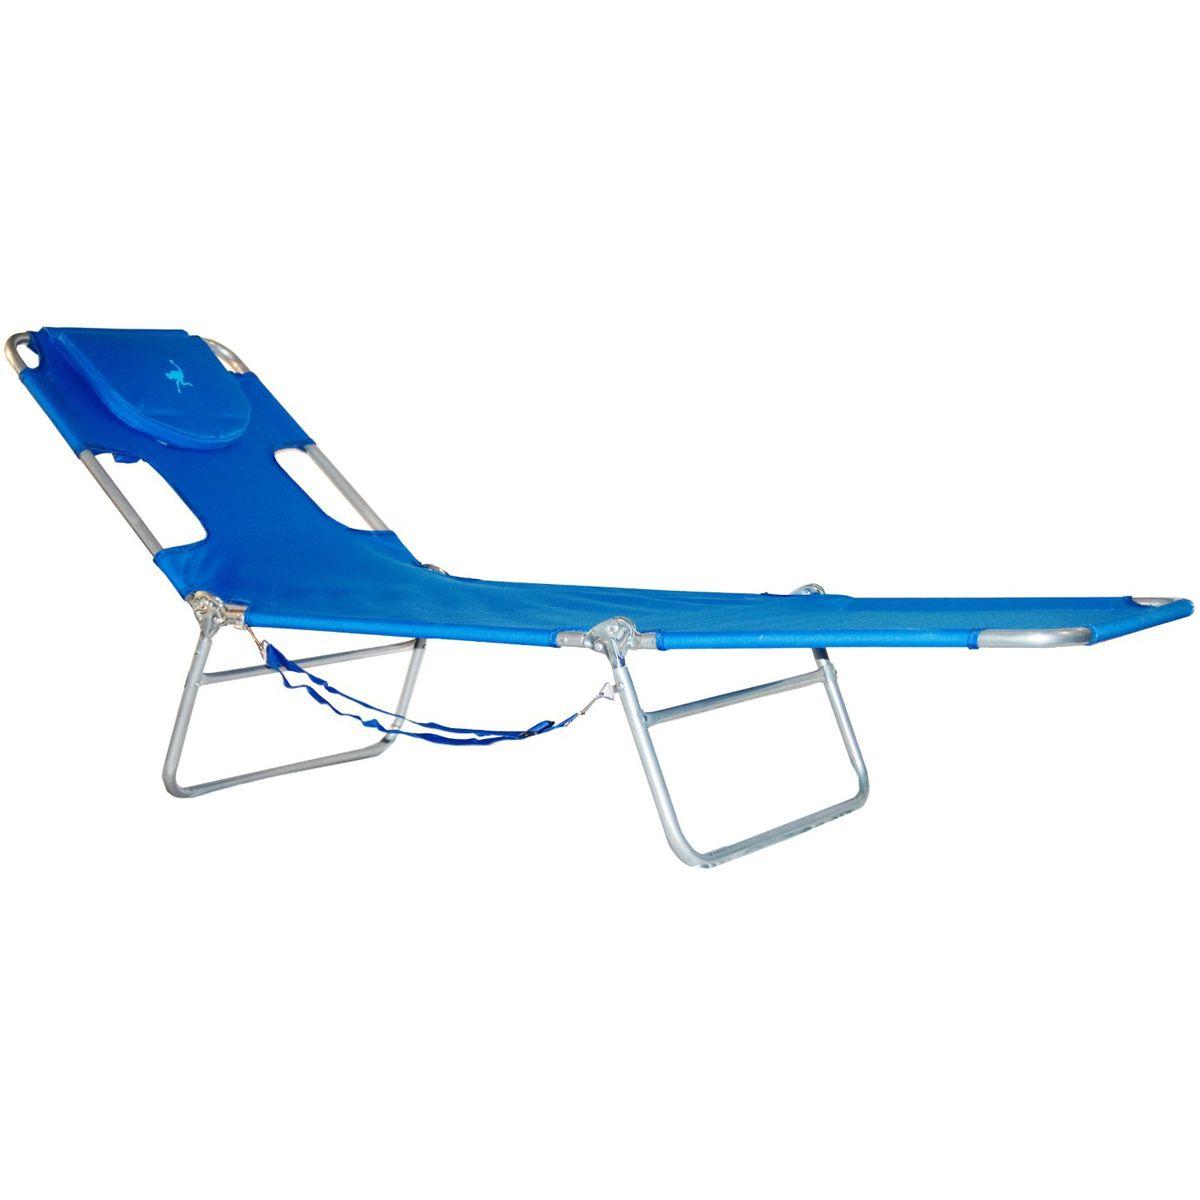 outdoor aluminum beach Loungers price